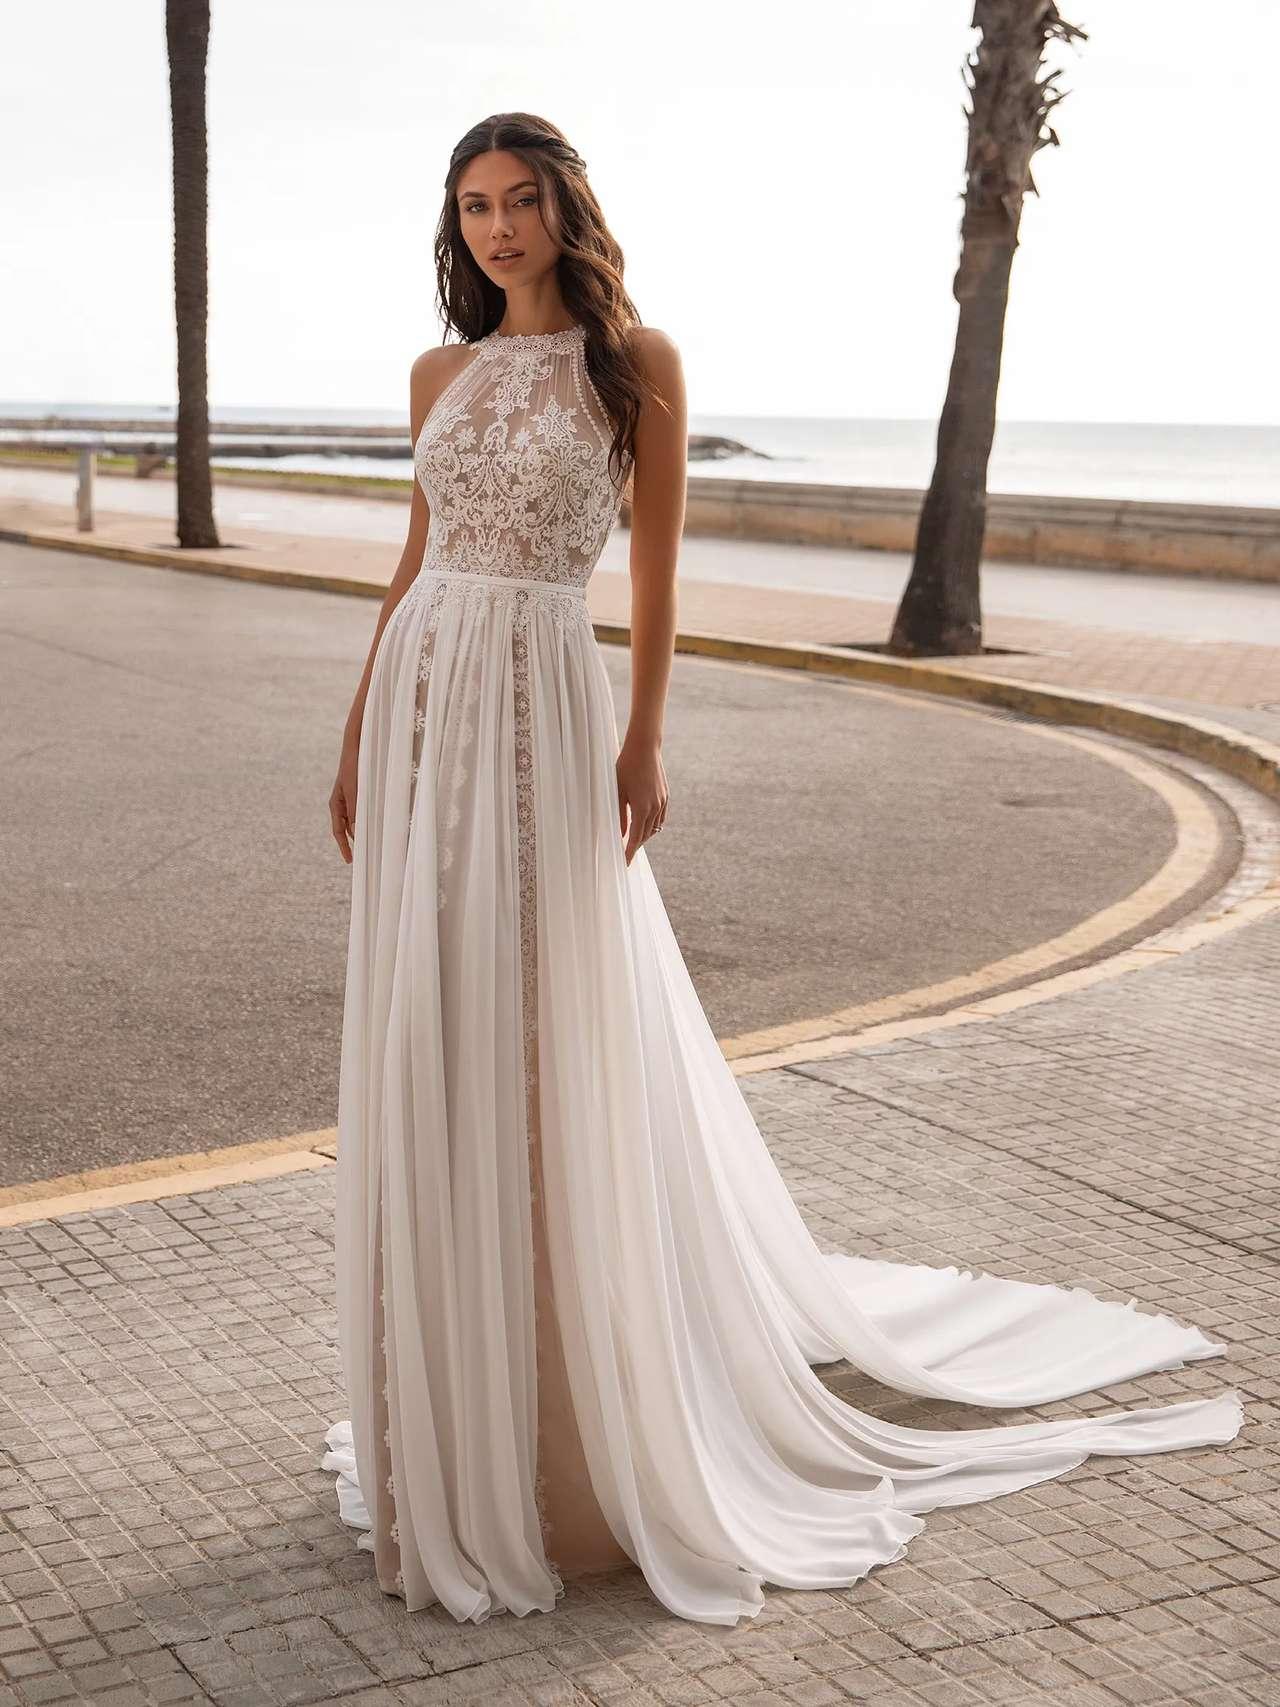 Granville menyasszonyi ruha - Pronovias 2021